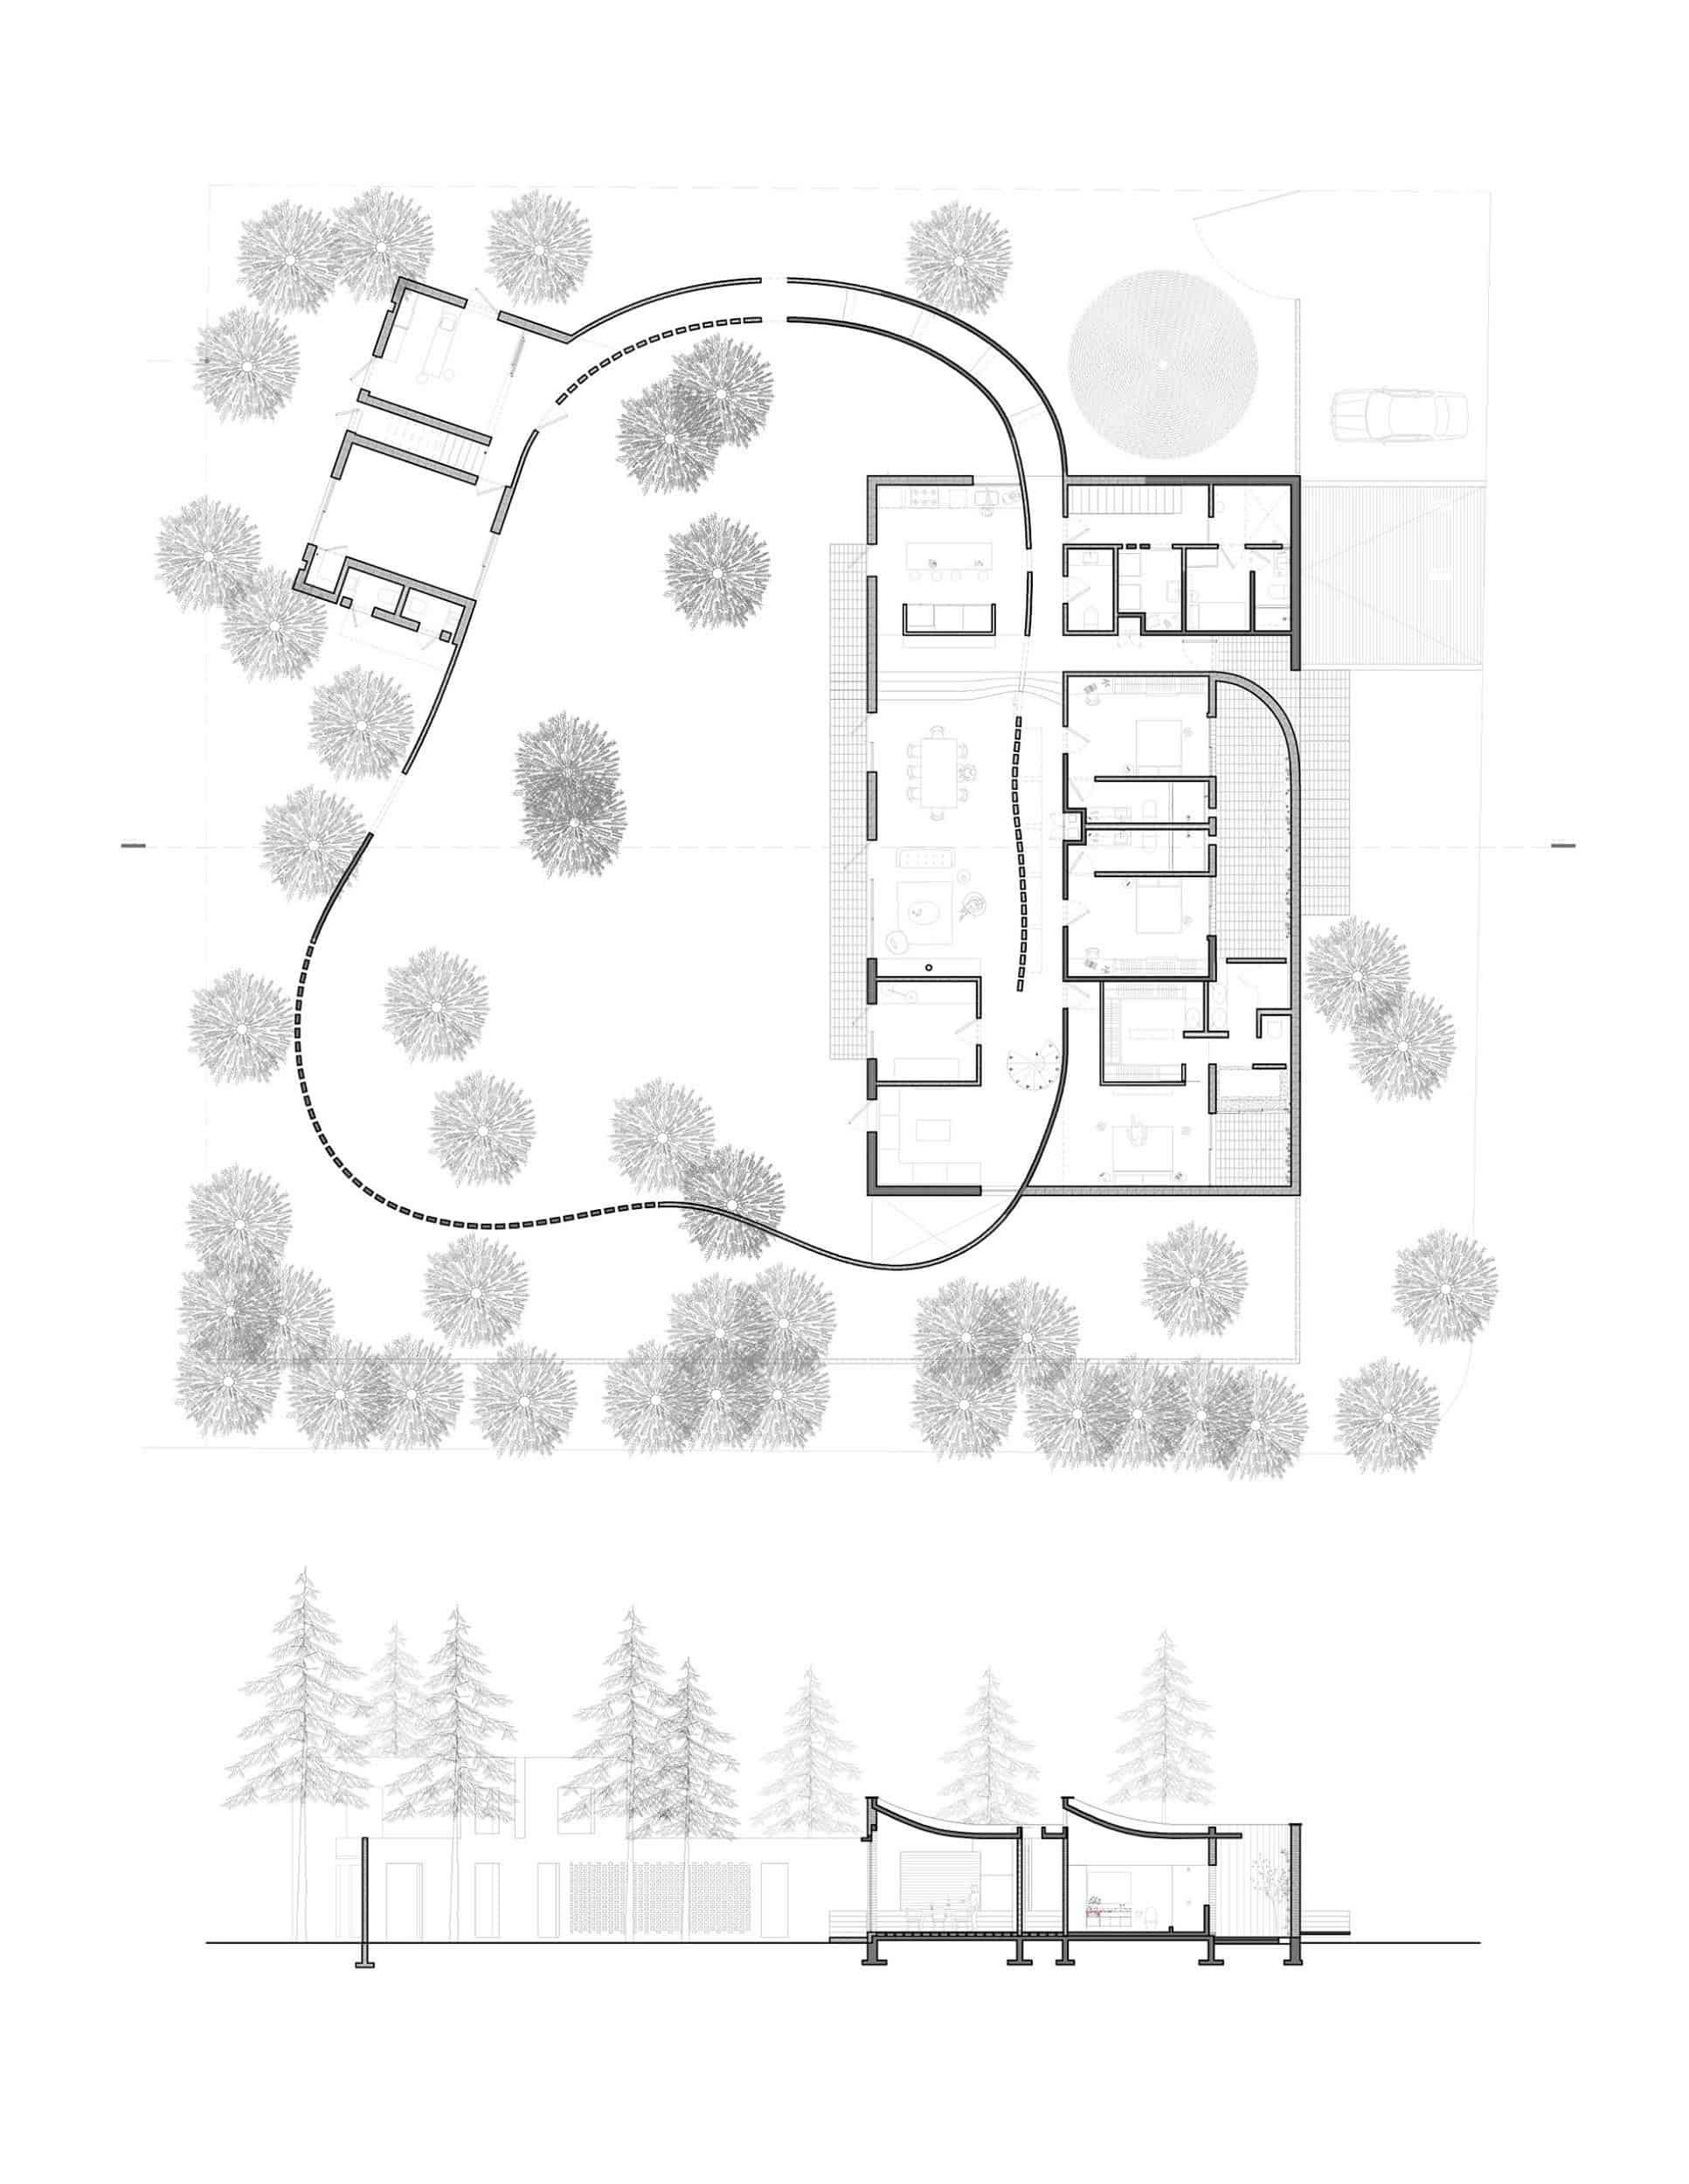 Floor plan of LANZA Altelier's first house